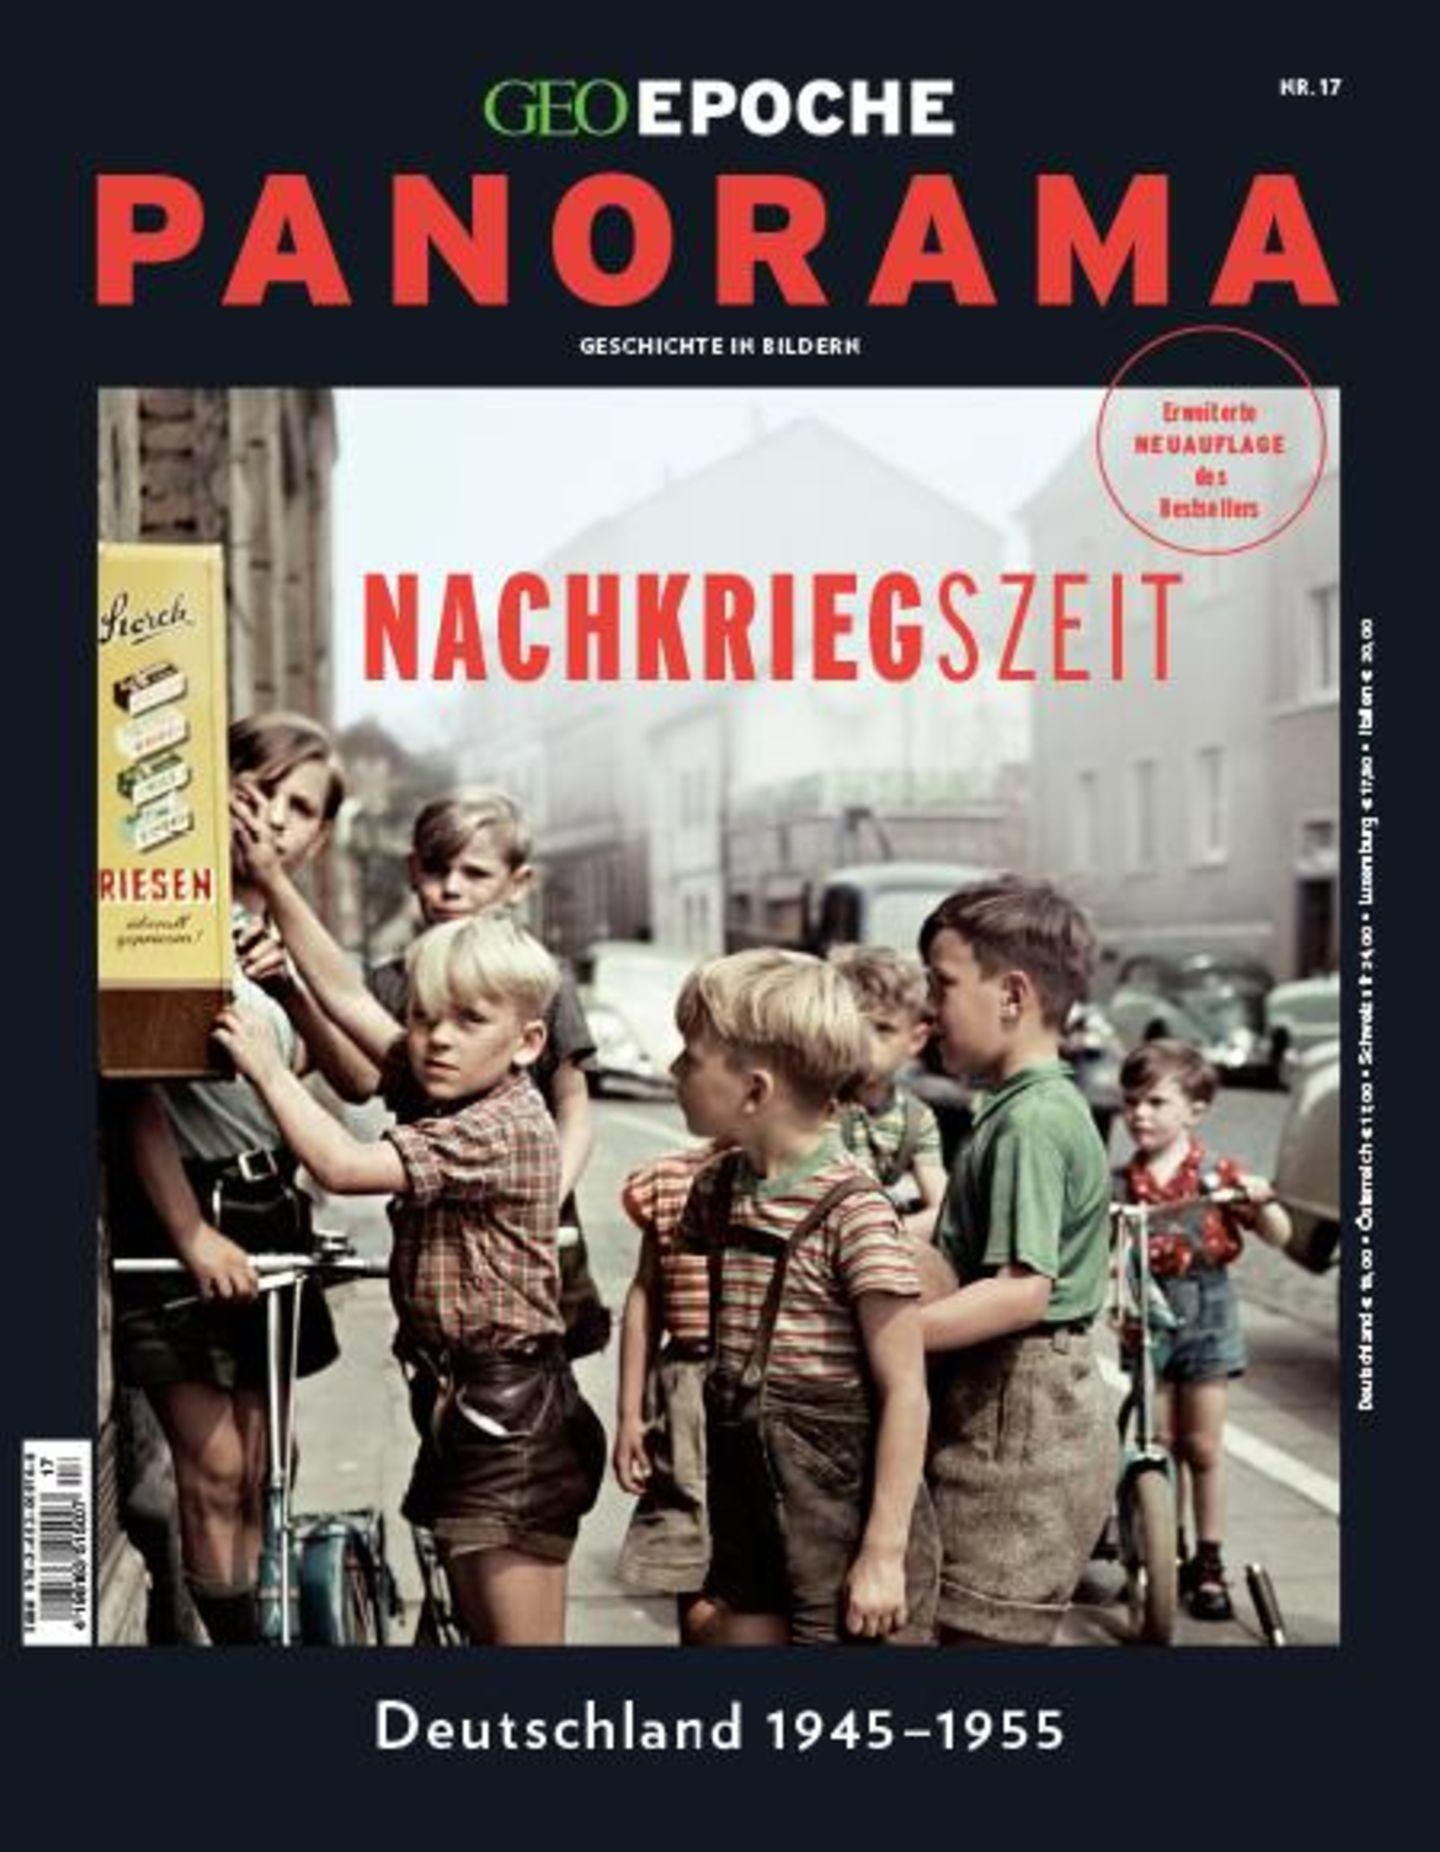 GEO Epoche Panorama - Nachkriegszeit